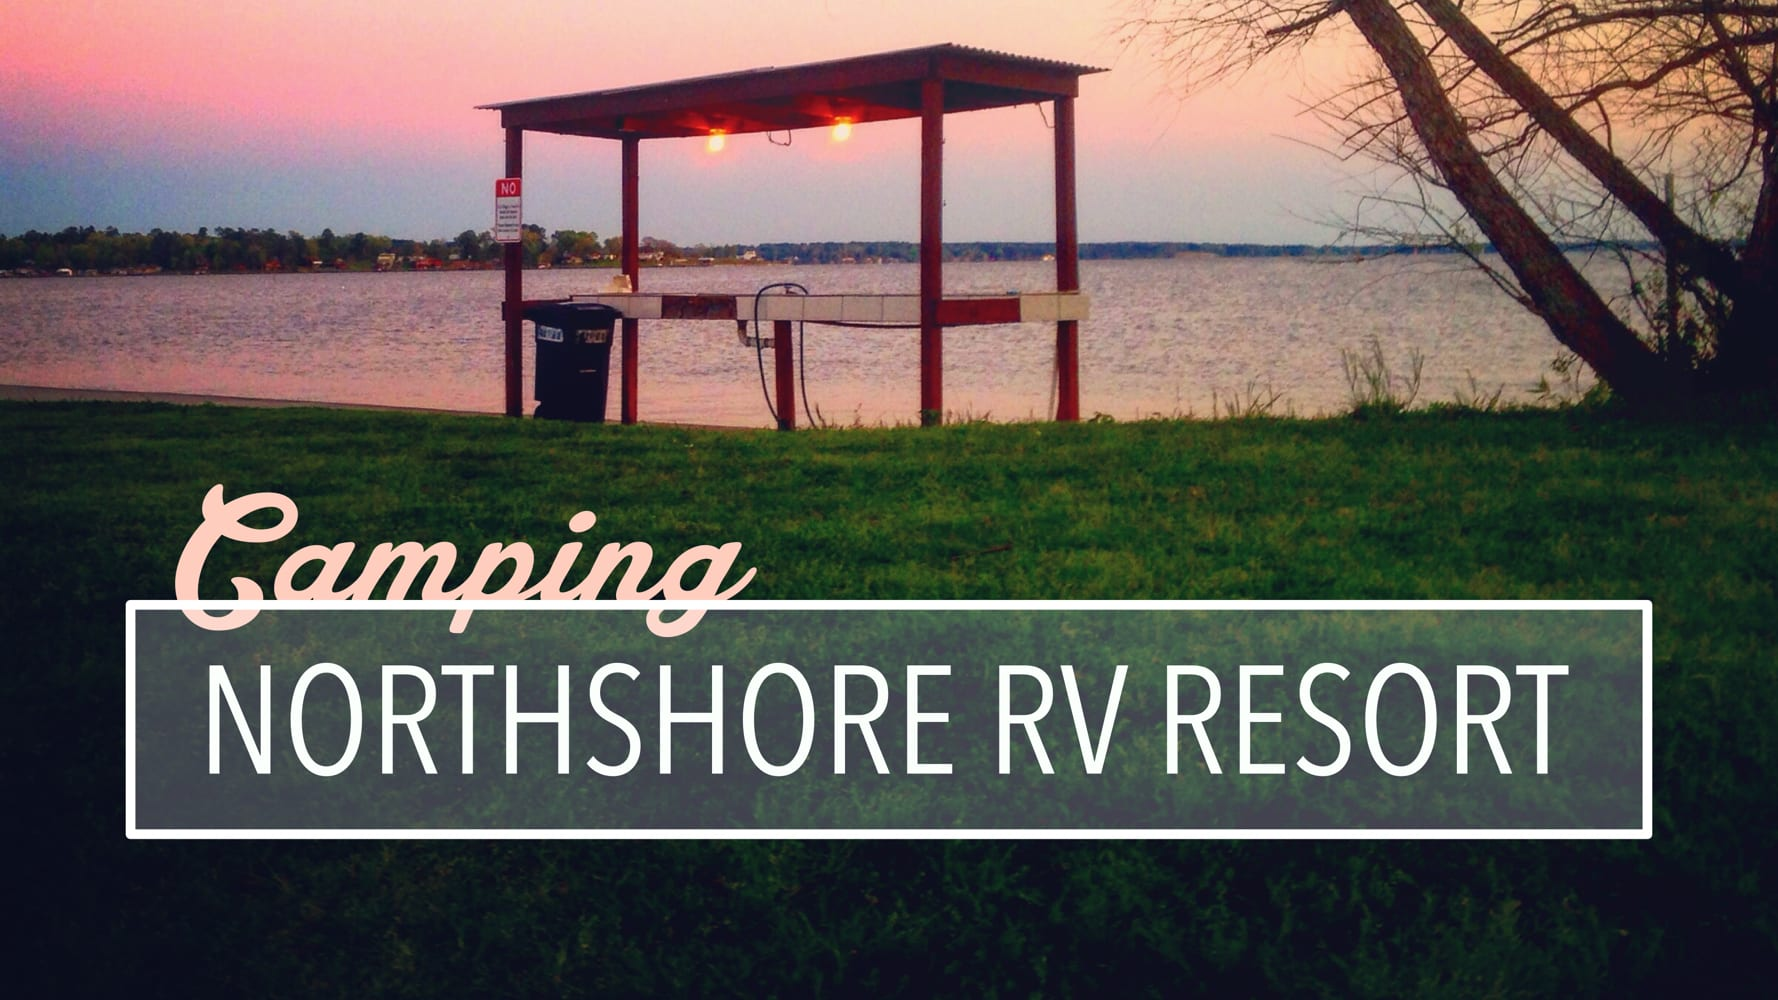 Camping at Northshore RV Resort – Onalaska, Texas on Lake Livingston